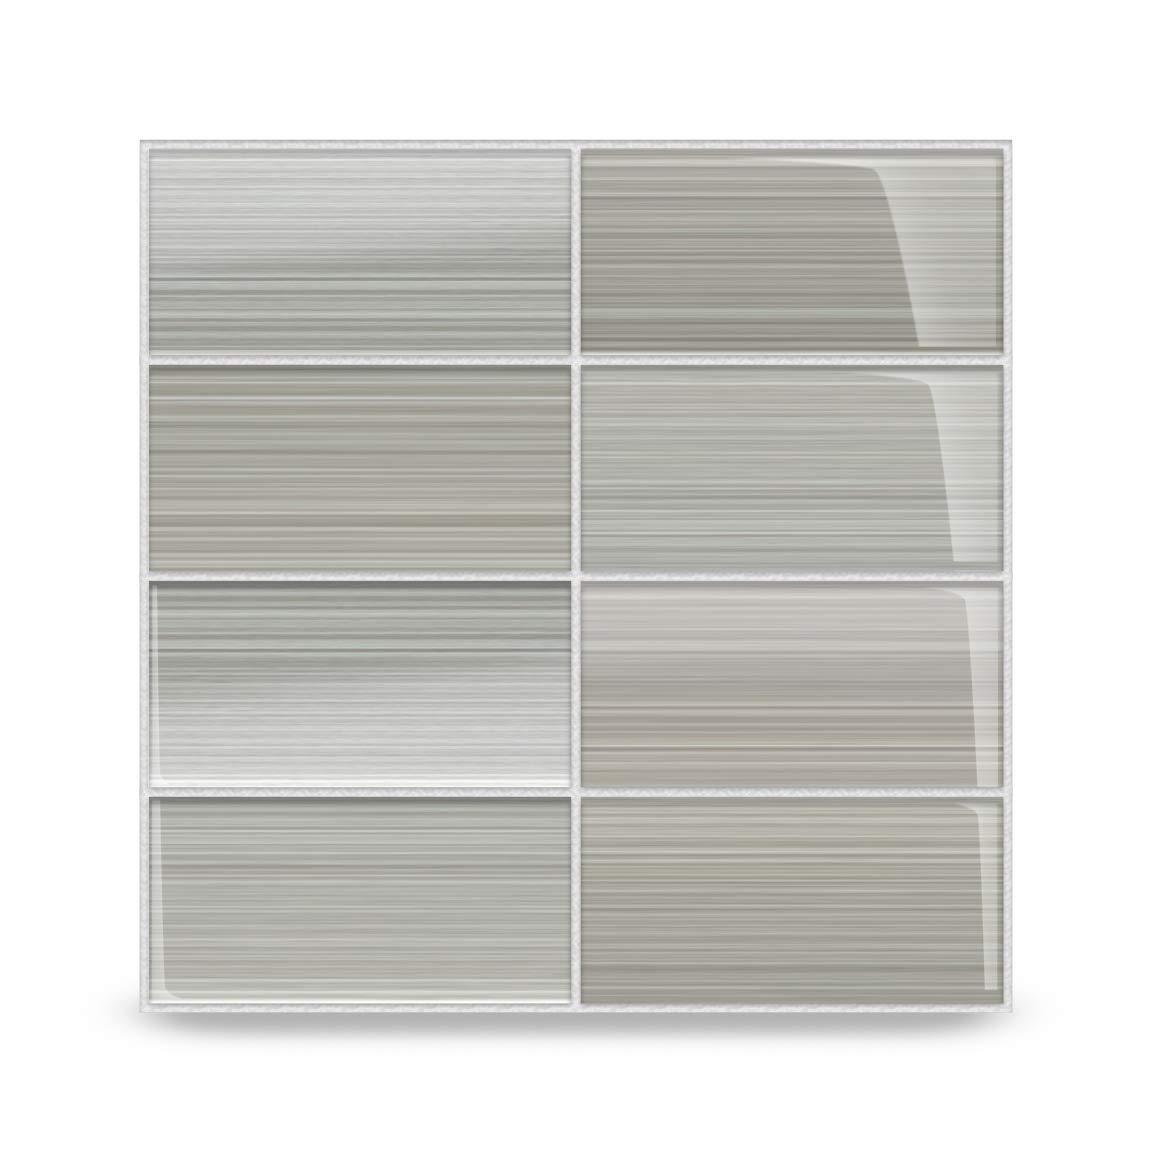 Gray Glass Subway Tile Gainsboro for Kitchen Backsplash or Bathroom from  Bodesi, 3x6